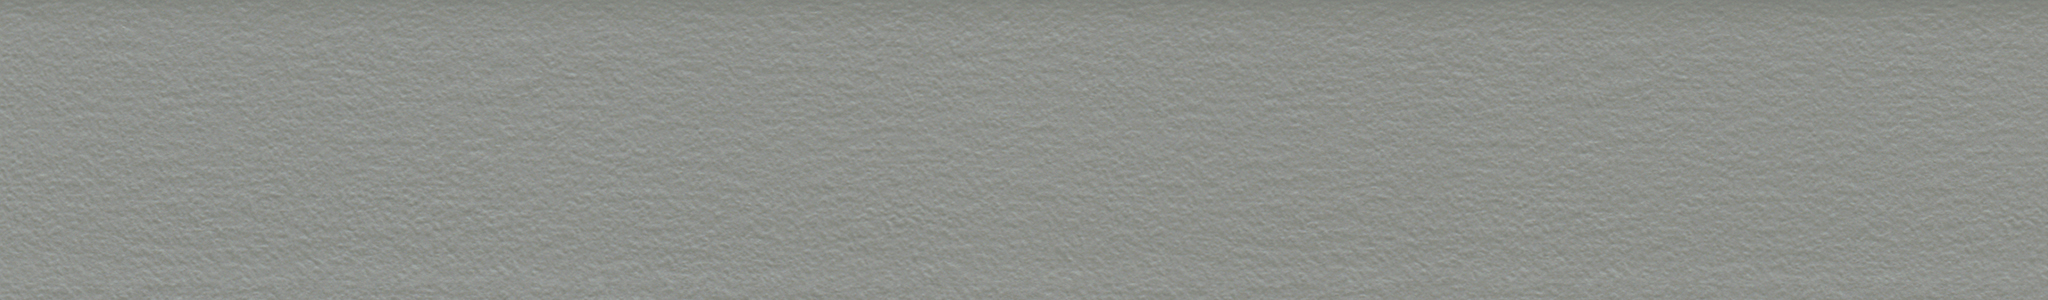 HU 17008 ABS Kante UNI Grau feinperl 107